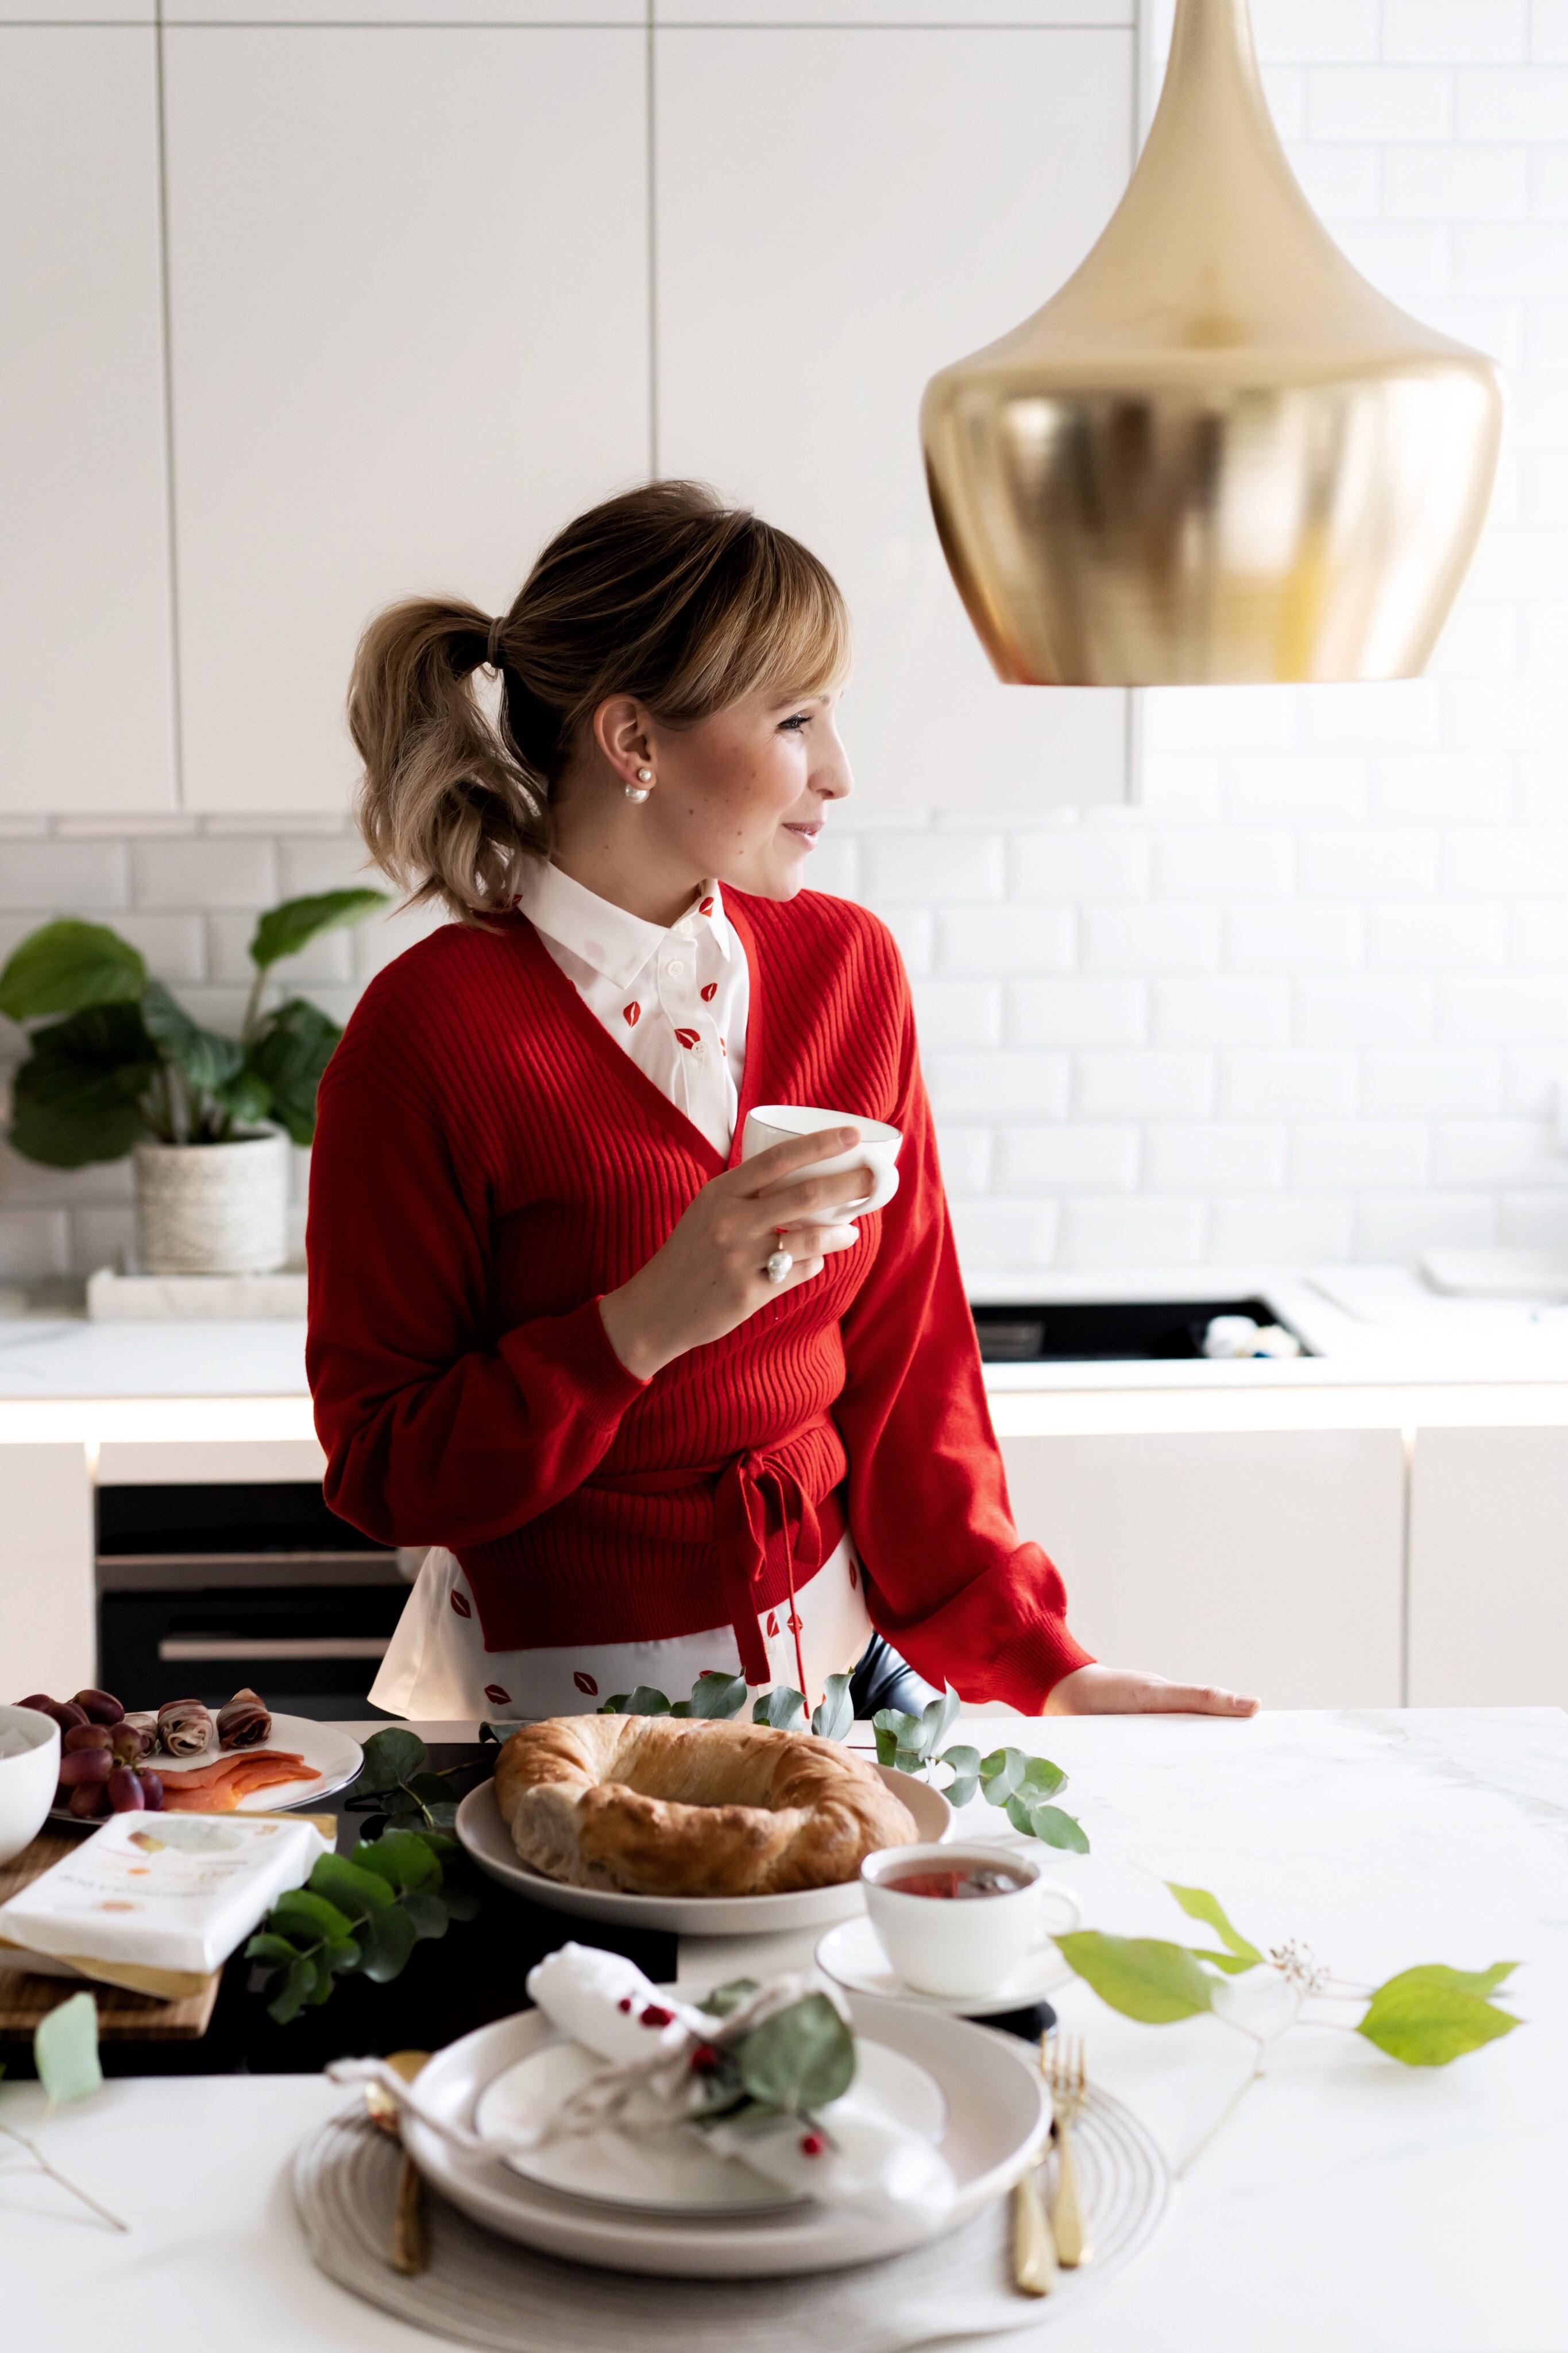 Der Adventsbrunch: Mein perfektes Genussritual